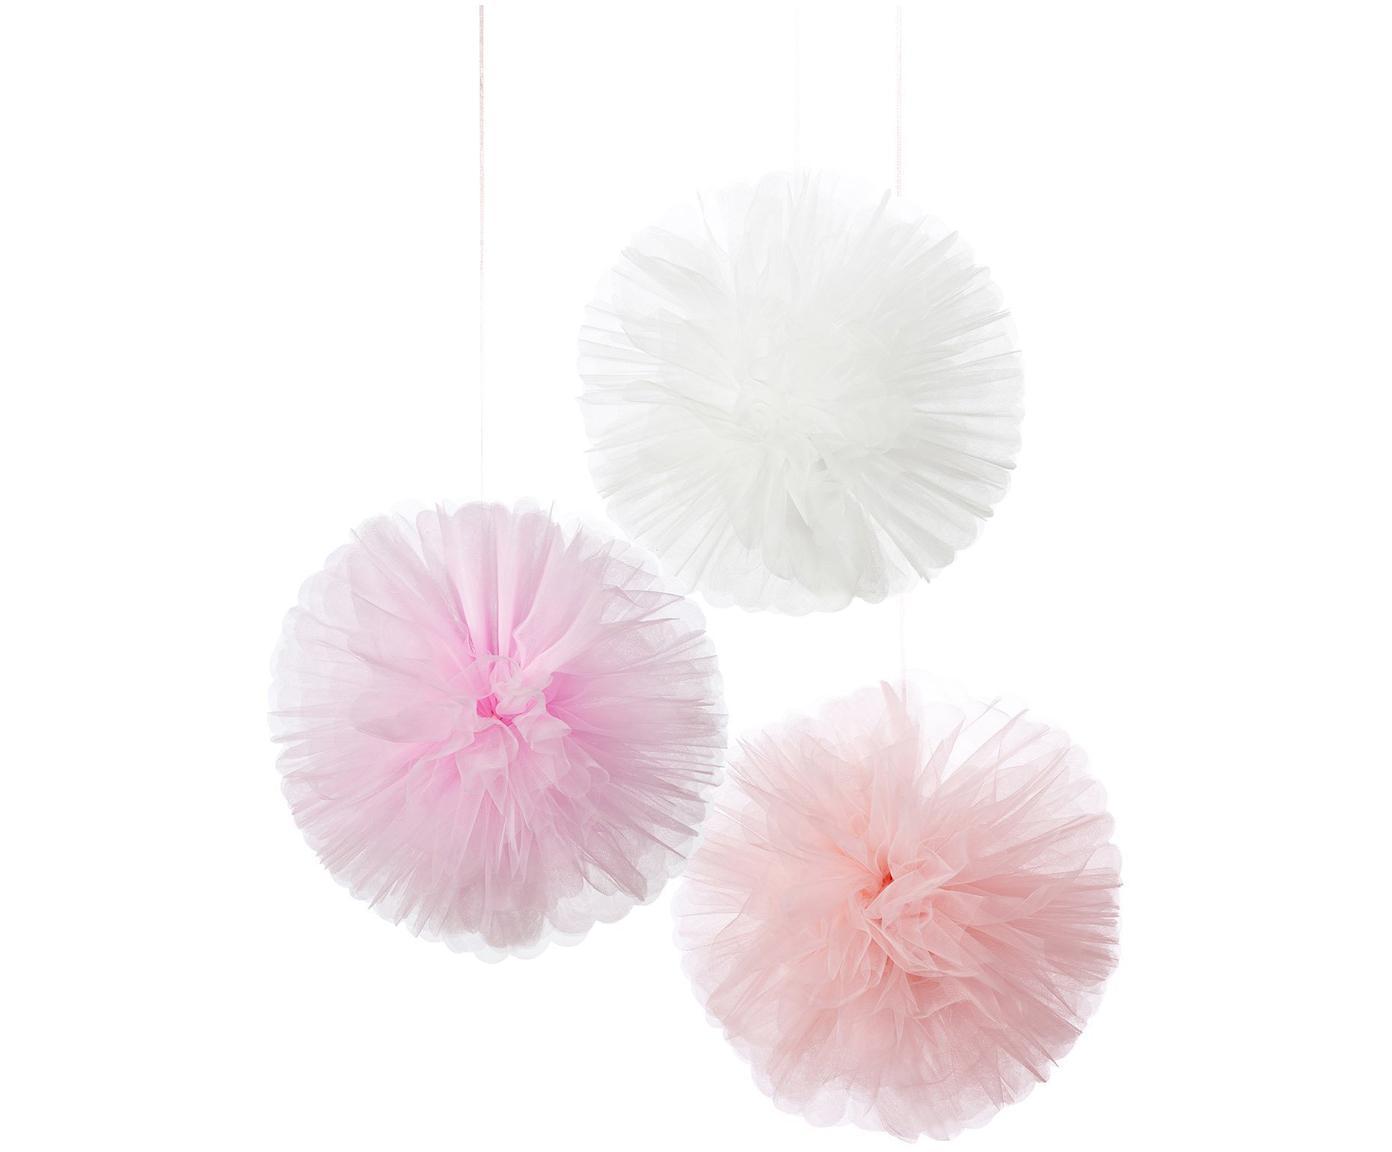 Pompons-Set We Heart, 3-tlg., Tüll (Polyester), Pink, Rosa, Weiß, Ø 25 x H 25 cm